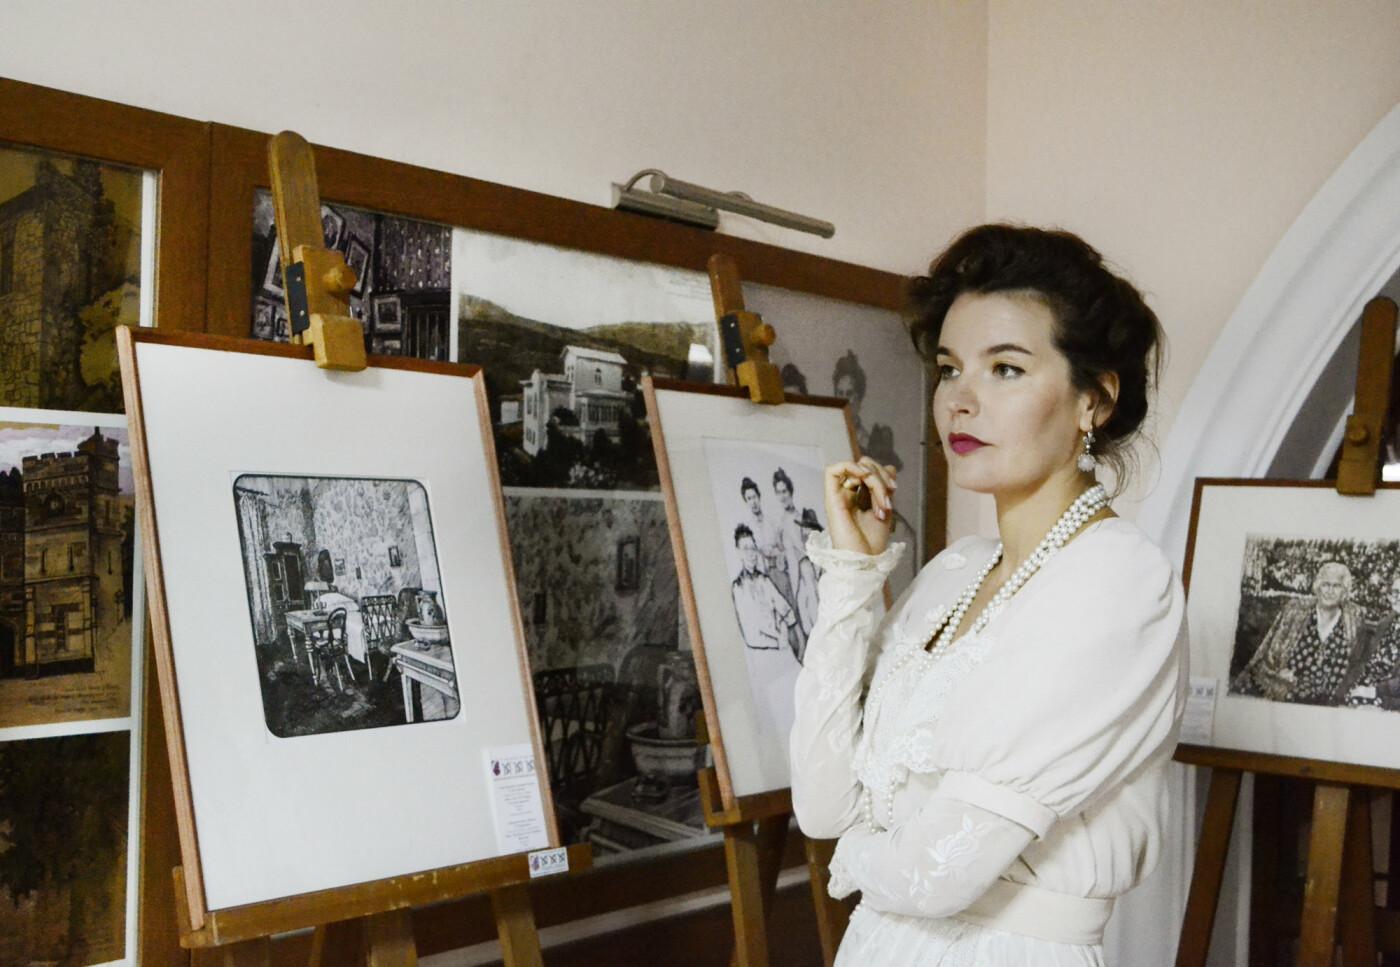 Как Ялта отметила 160 лет со дня рождения Антона Павловича Чехова, фото-5